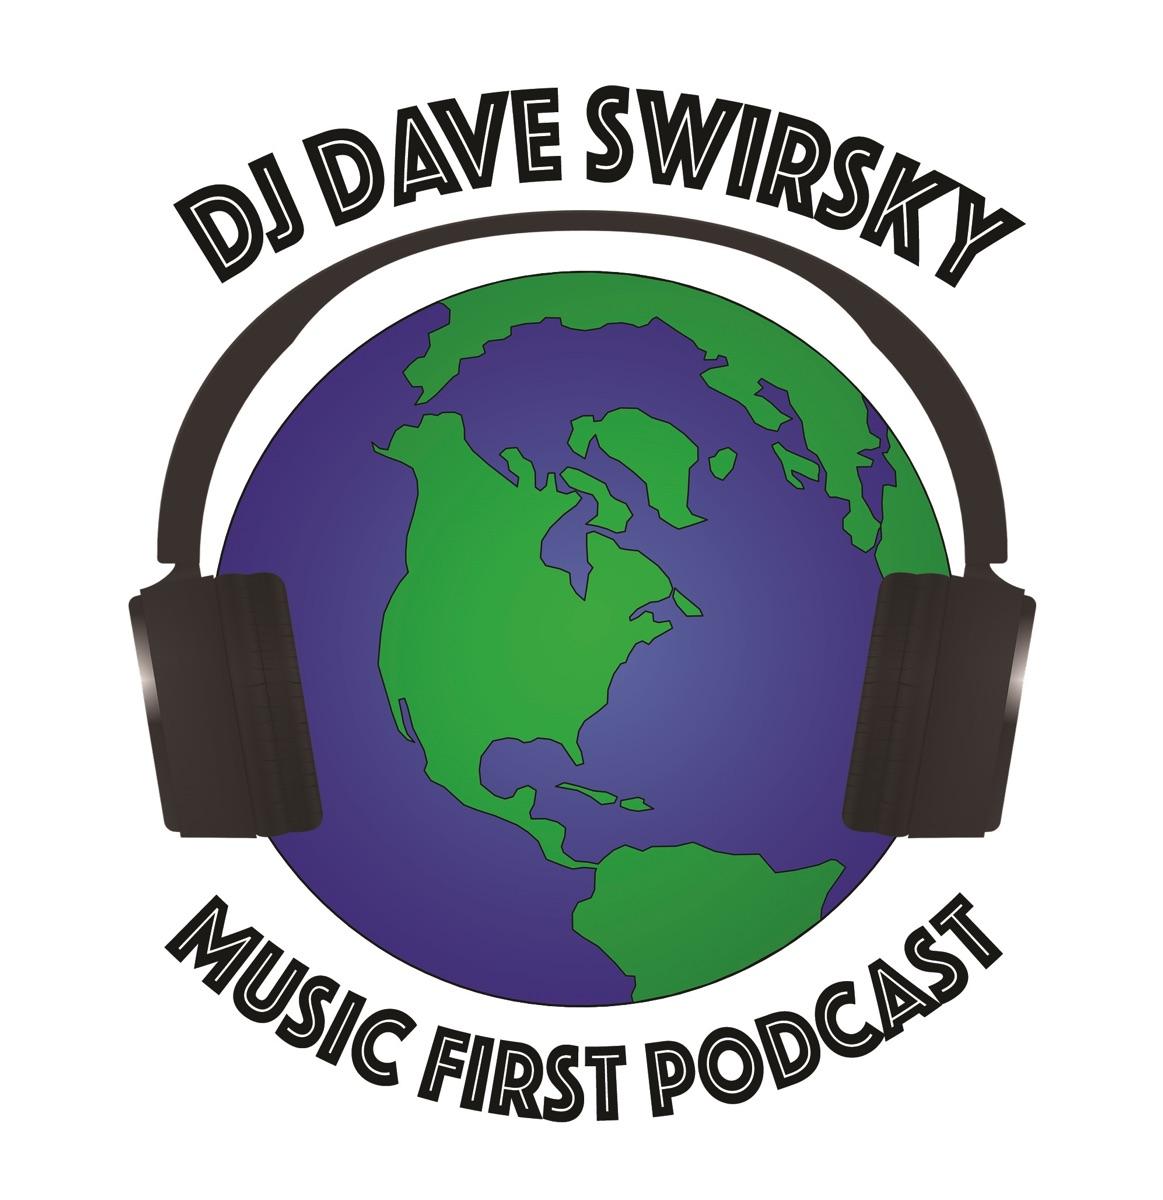 Music First with DJ Dave Swirsky